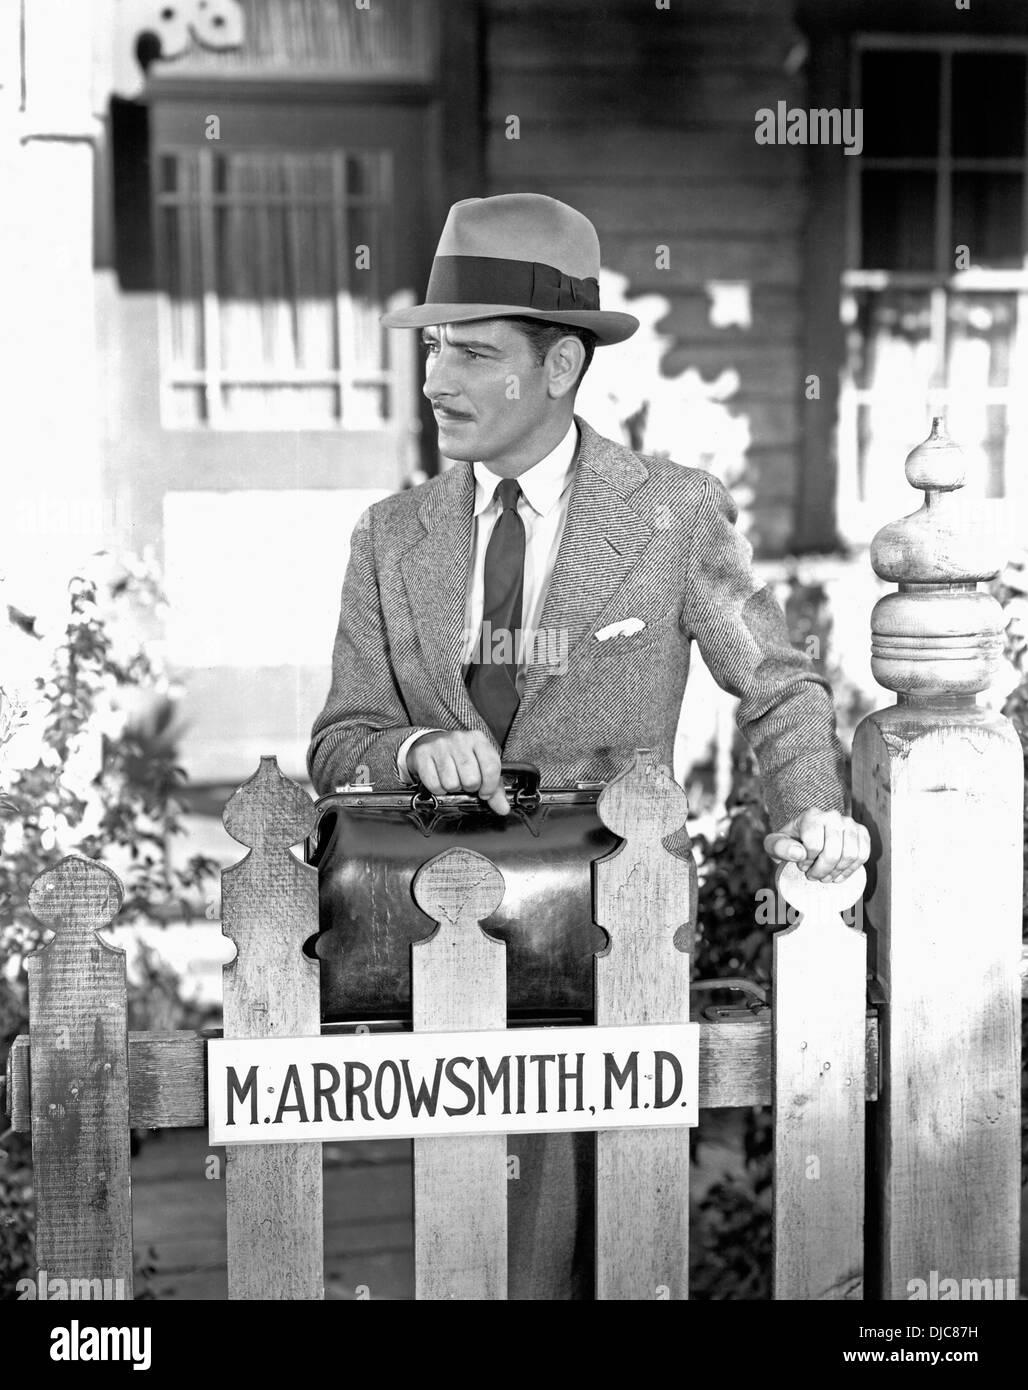 Ronald Colman on-set of the Film, Arrowsmith, 1931 - Stock Image